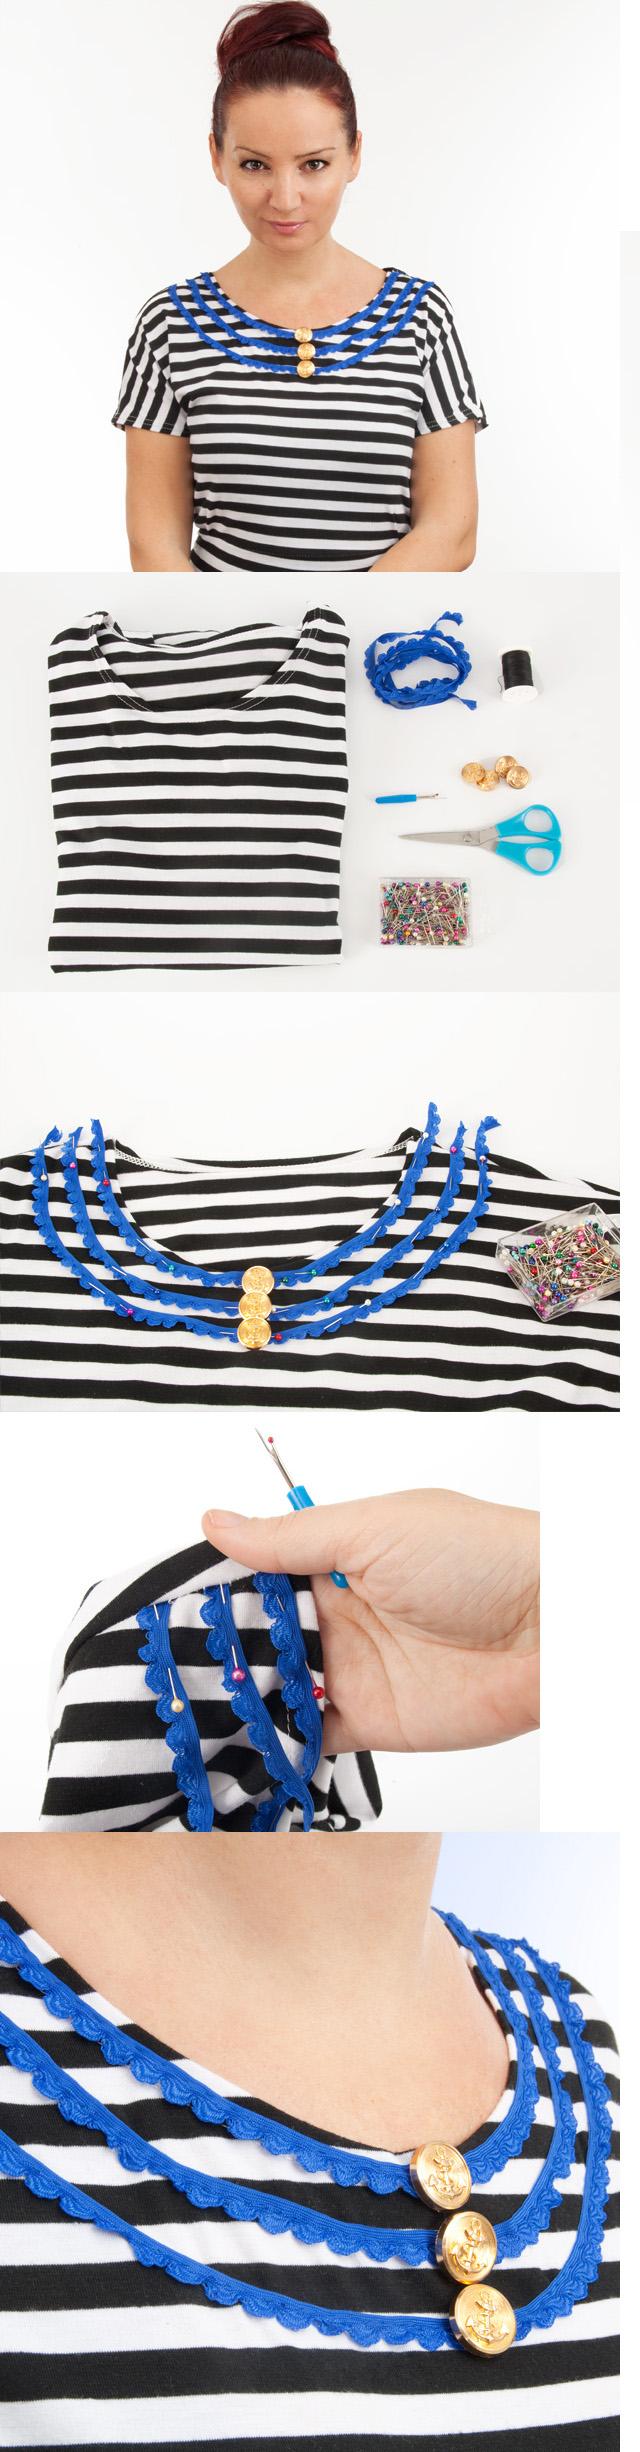 Clothing Tutorials DIY navy shirt